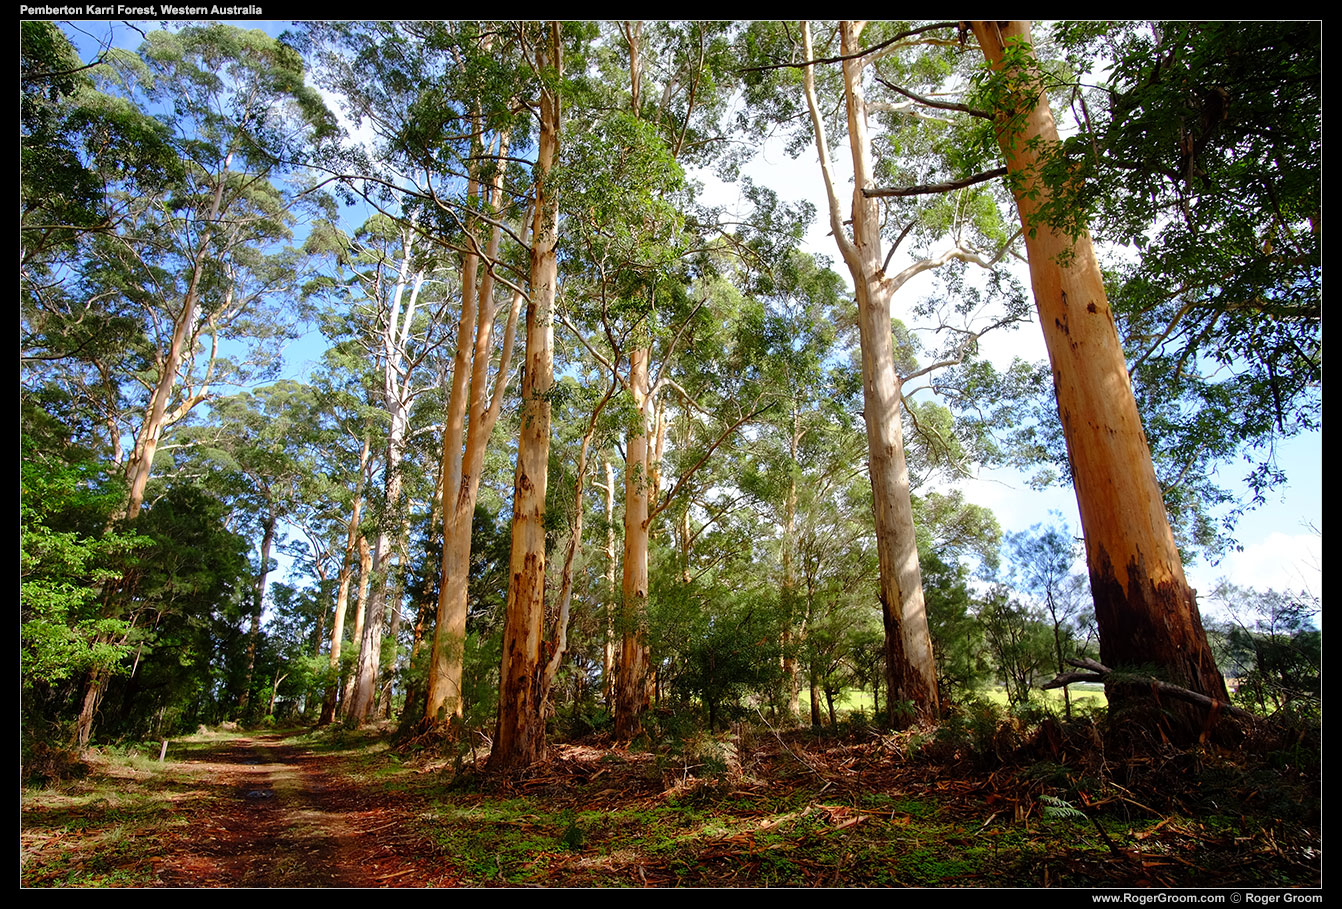 Karri Forest in Pemberton, Western Australia.